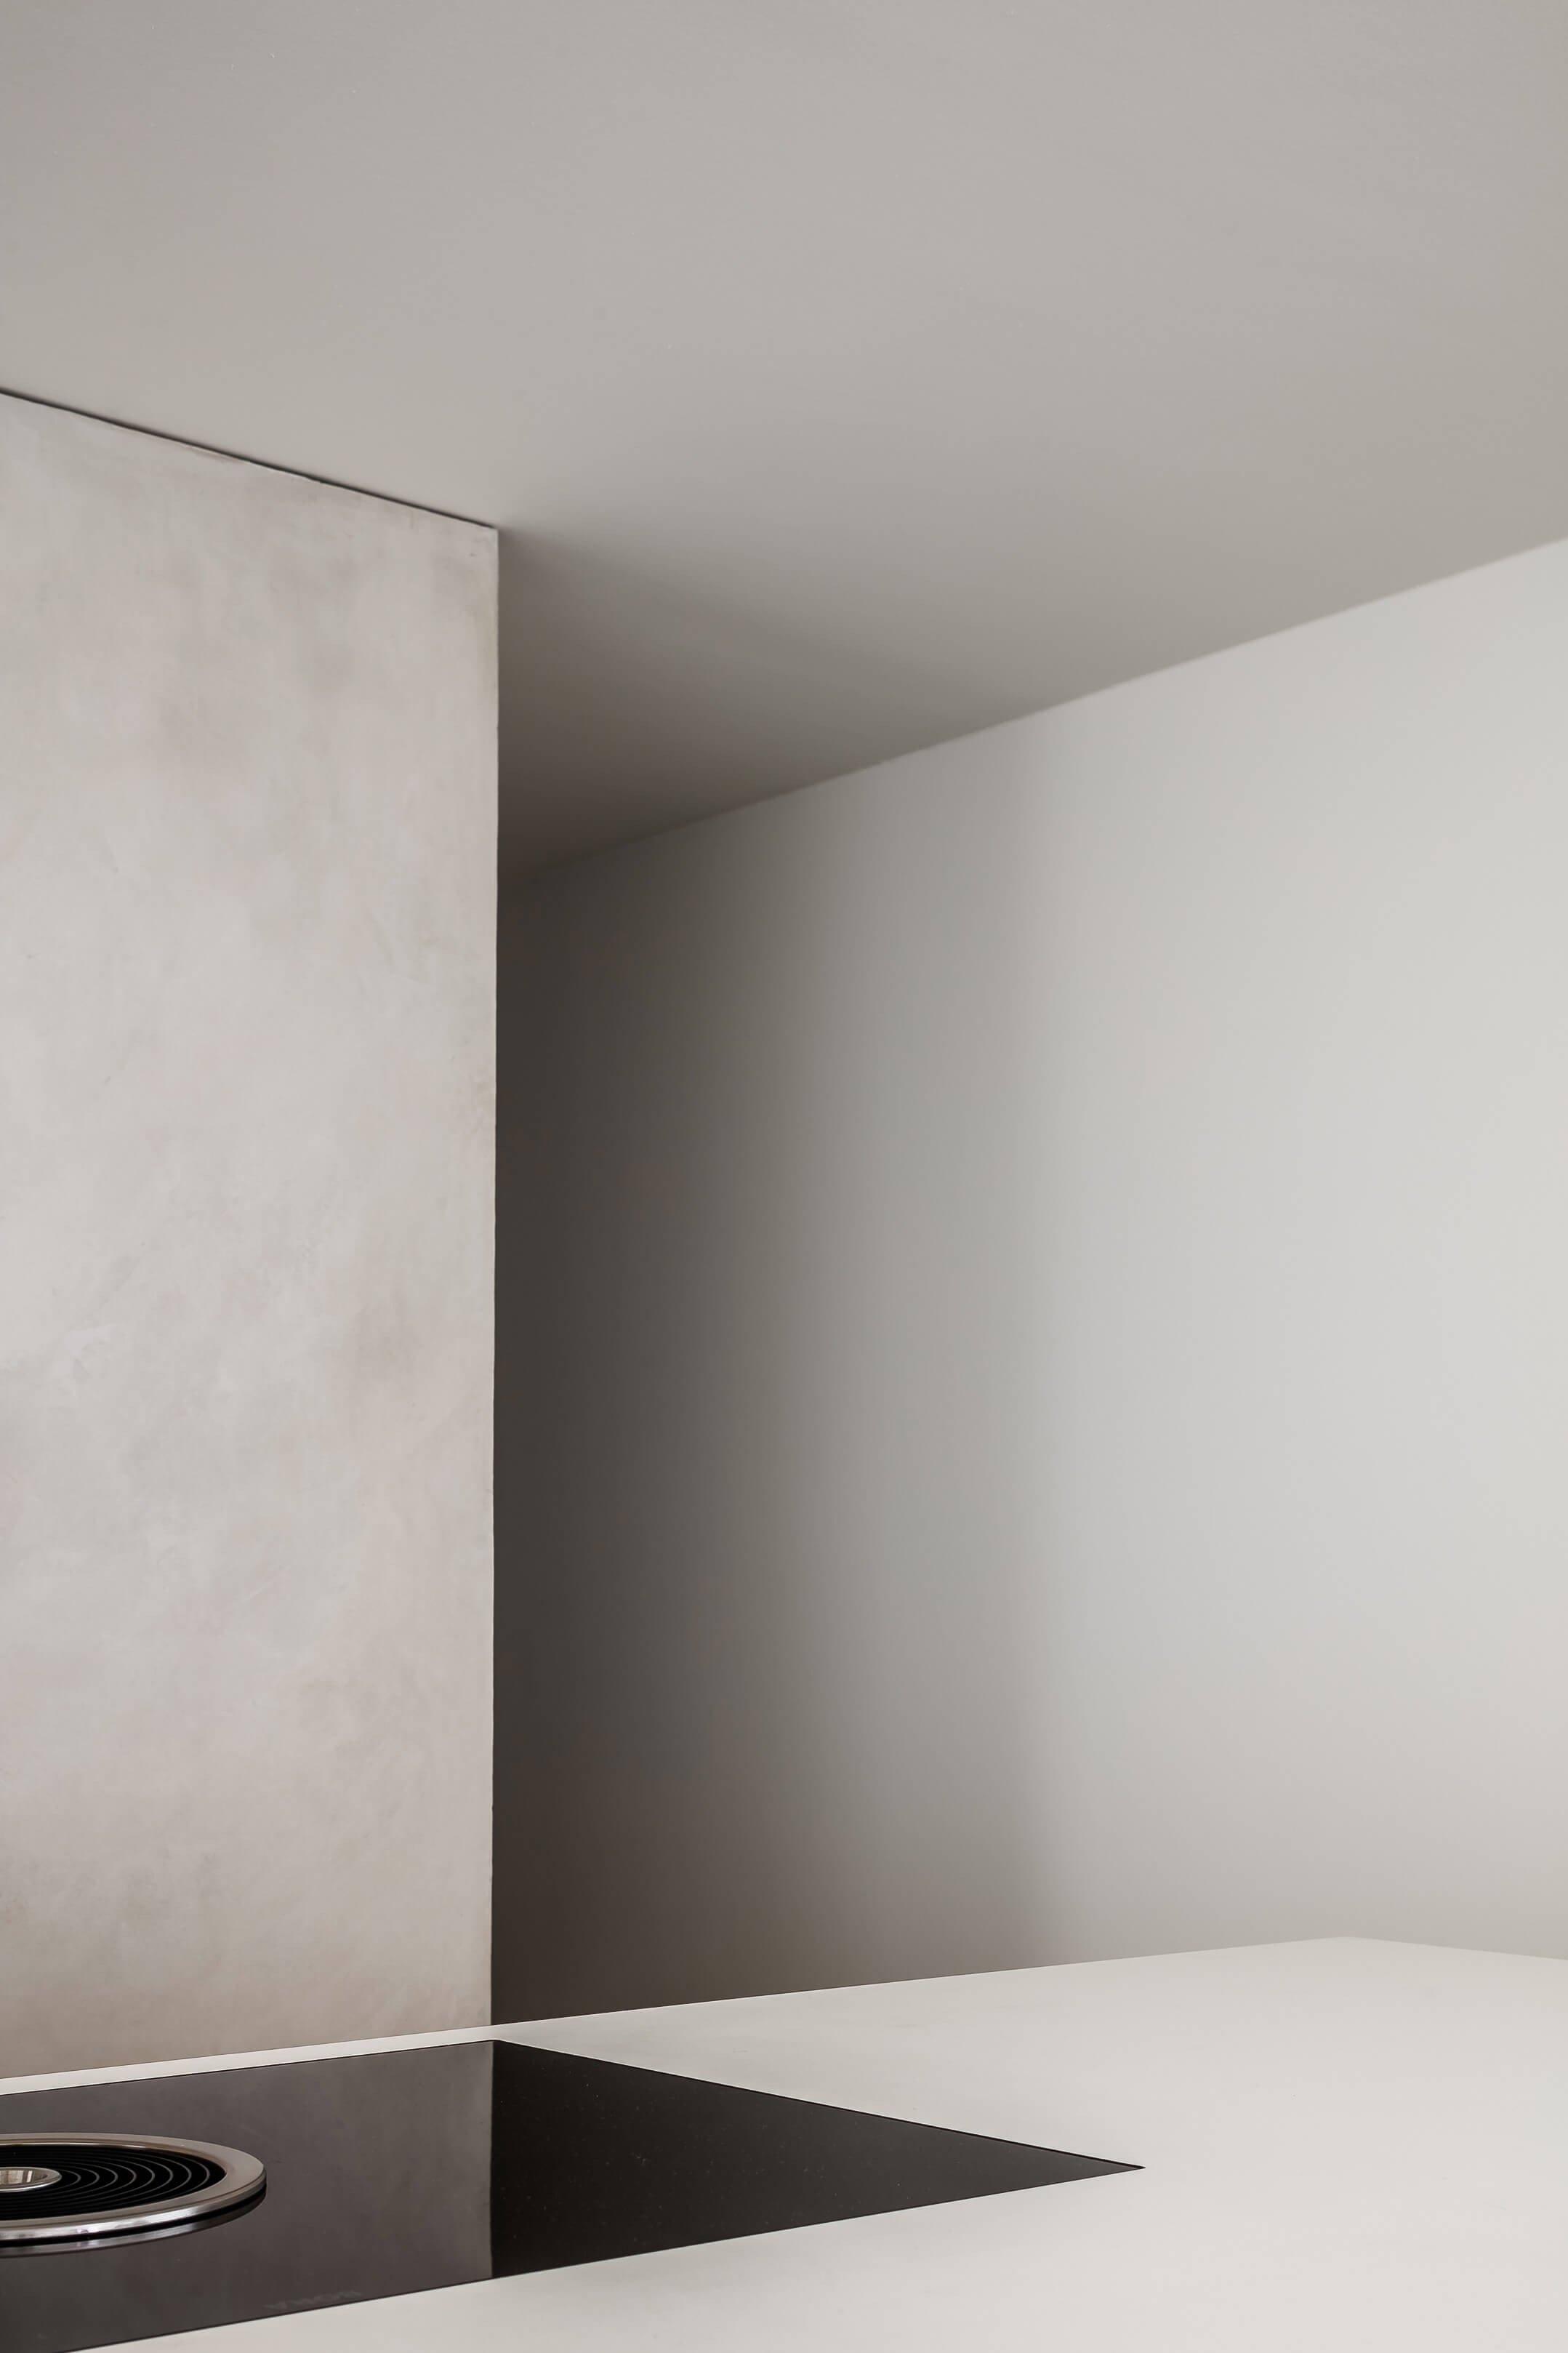 Rietveldprojects.be-five-am-rrr-odilon-creations-photobycafeine23